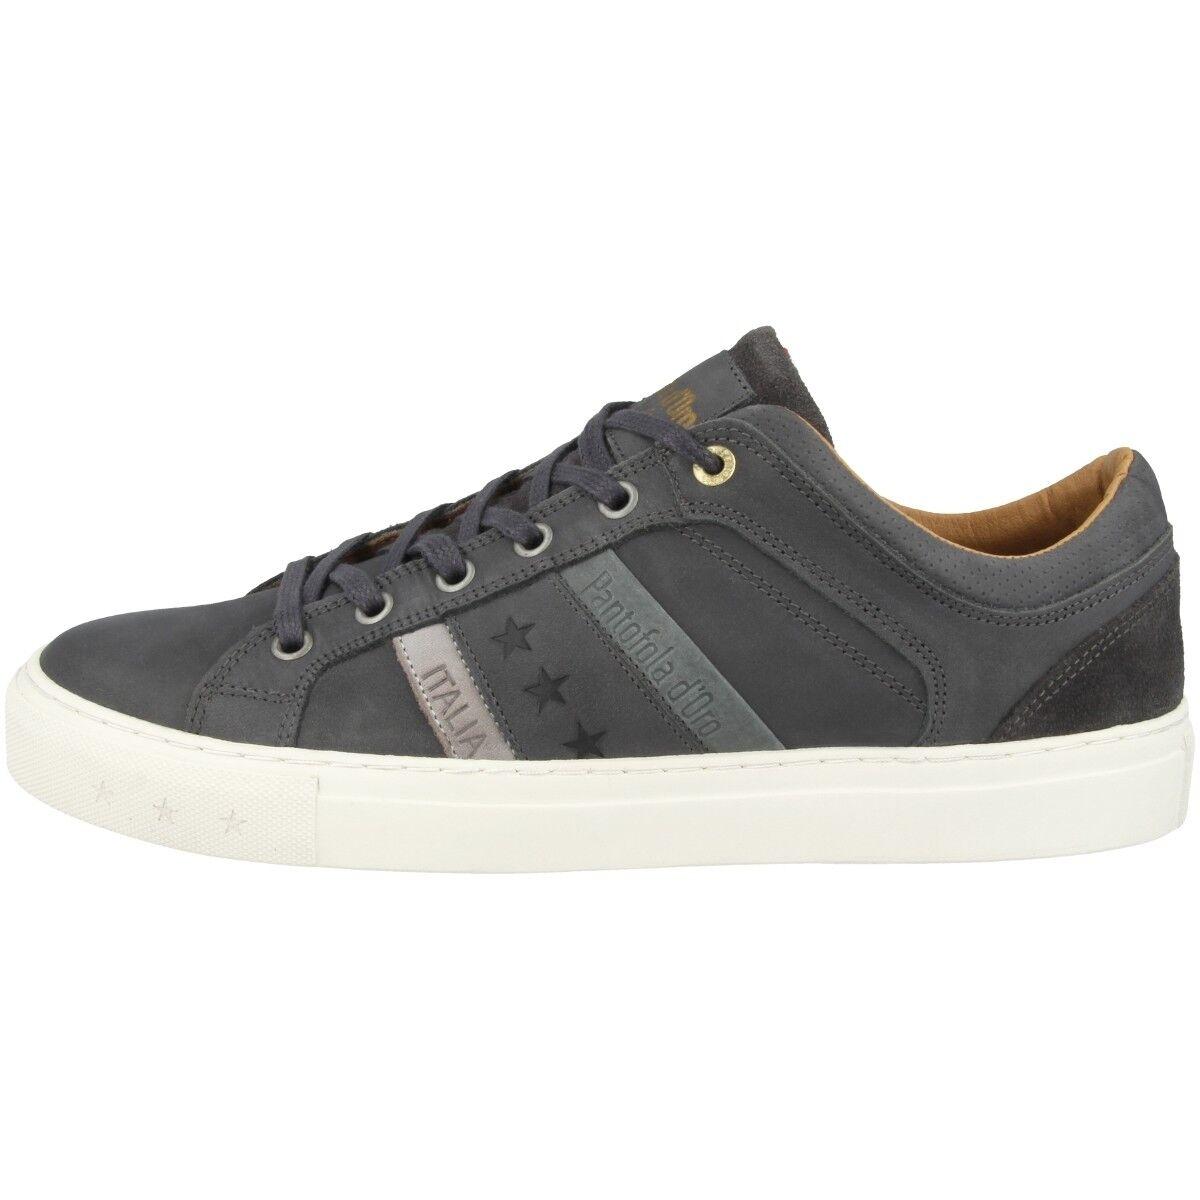 Pantofola D ORO MONZA Uomo Low Cut Scarpe uomo sneaker Shadow 10173028.7zw